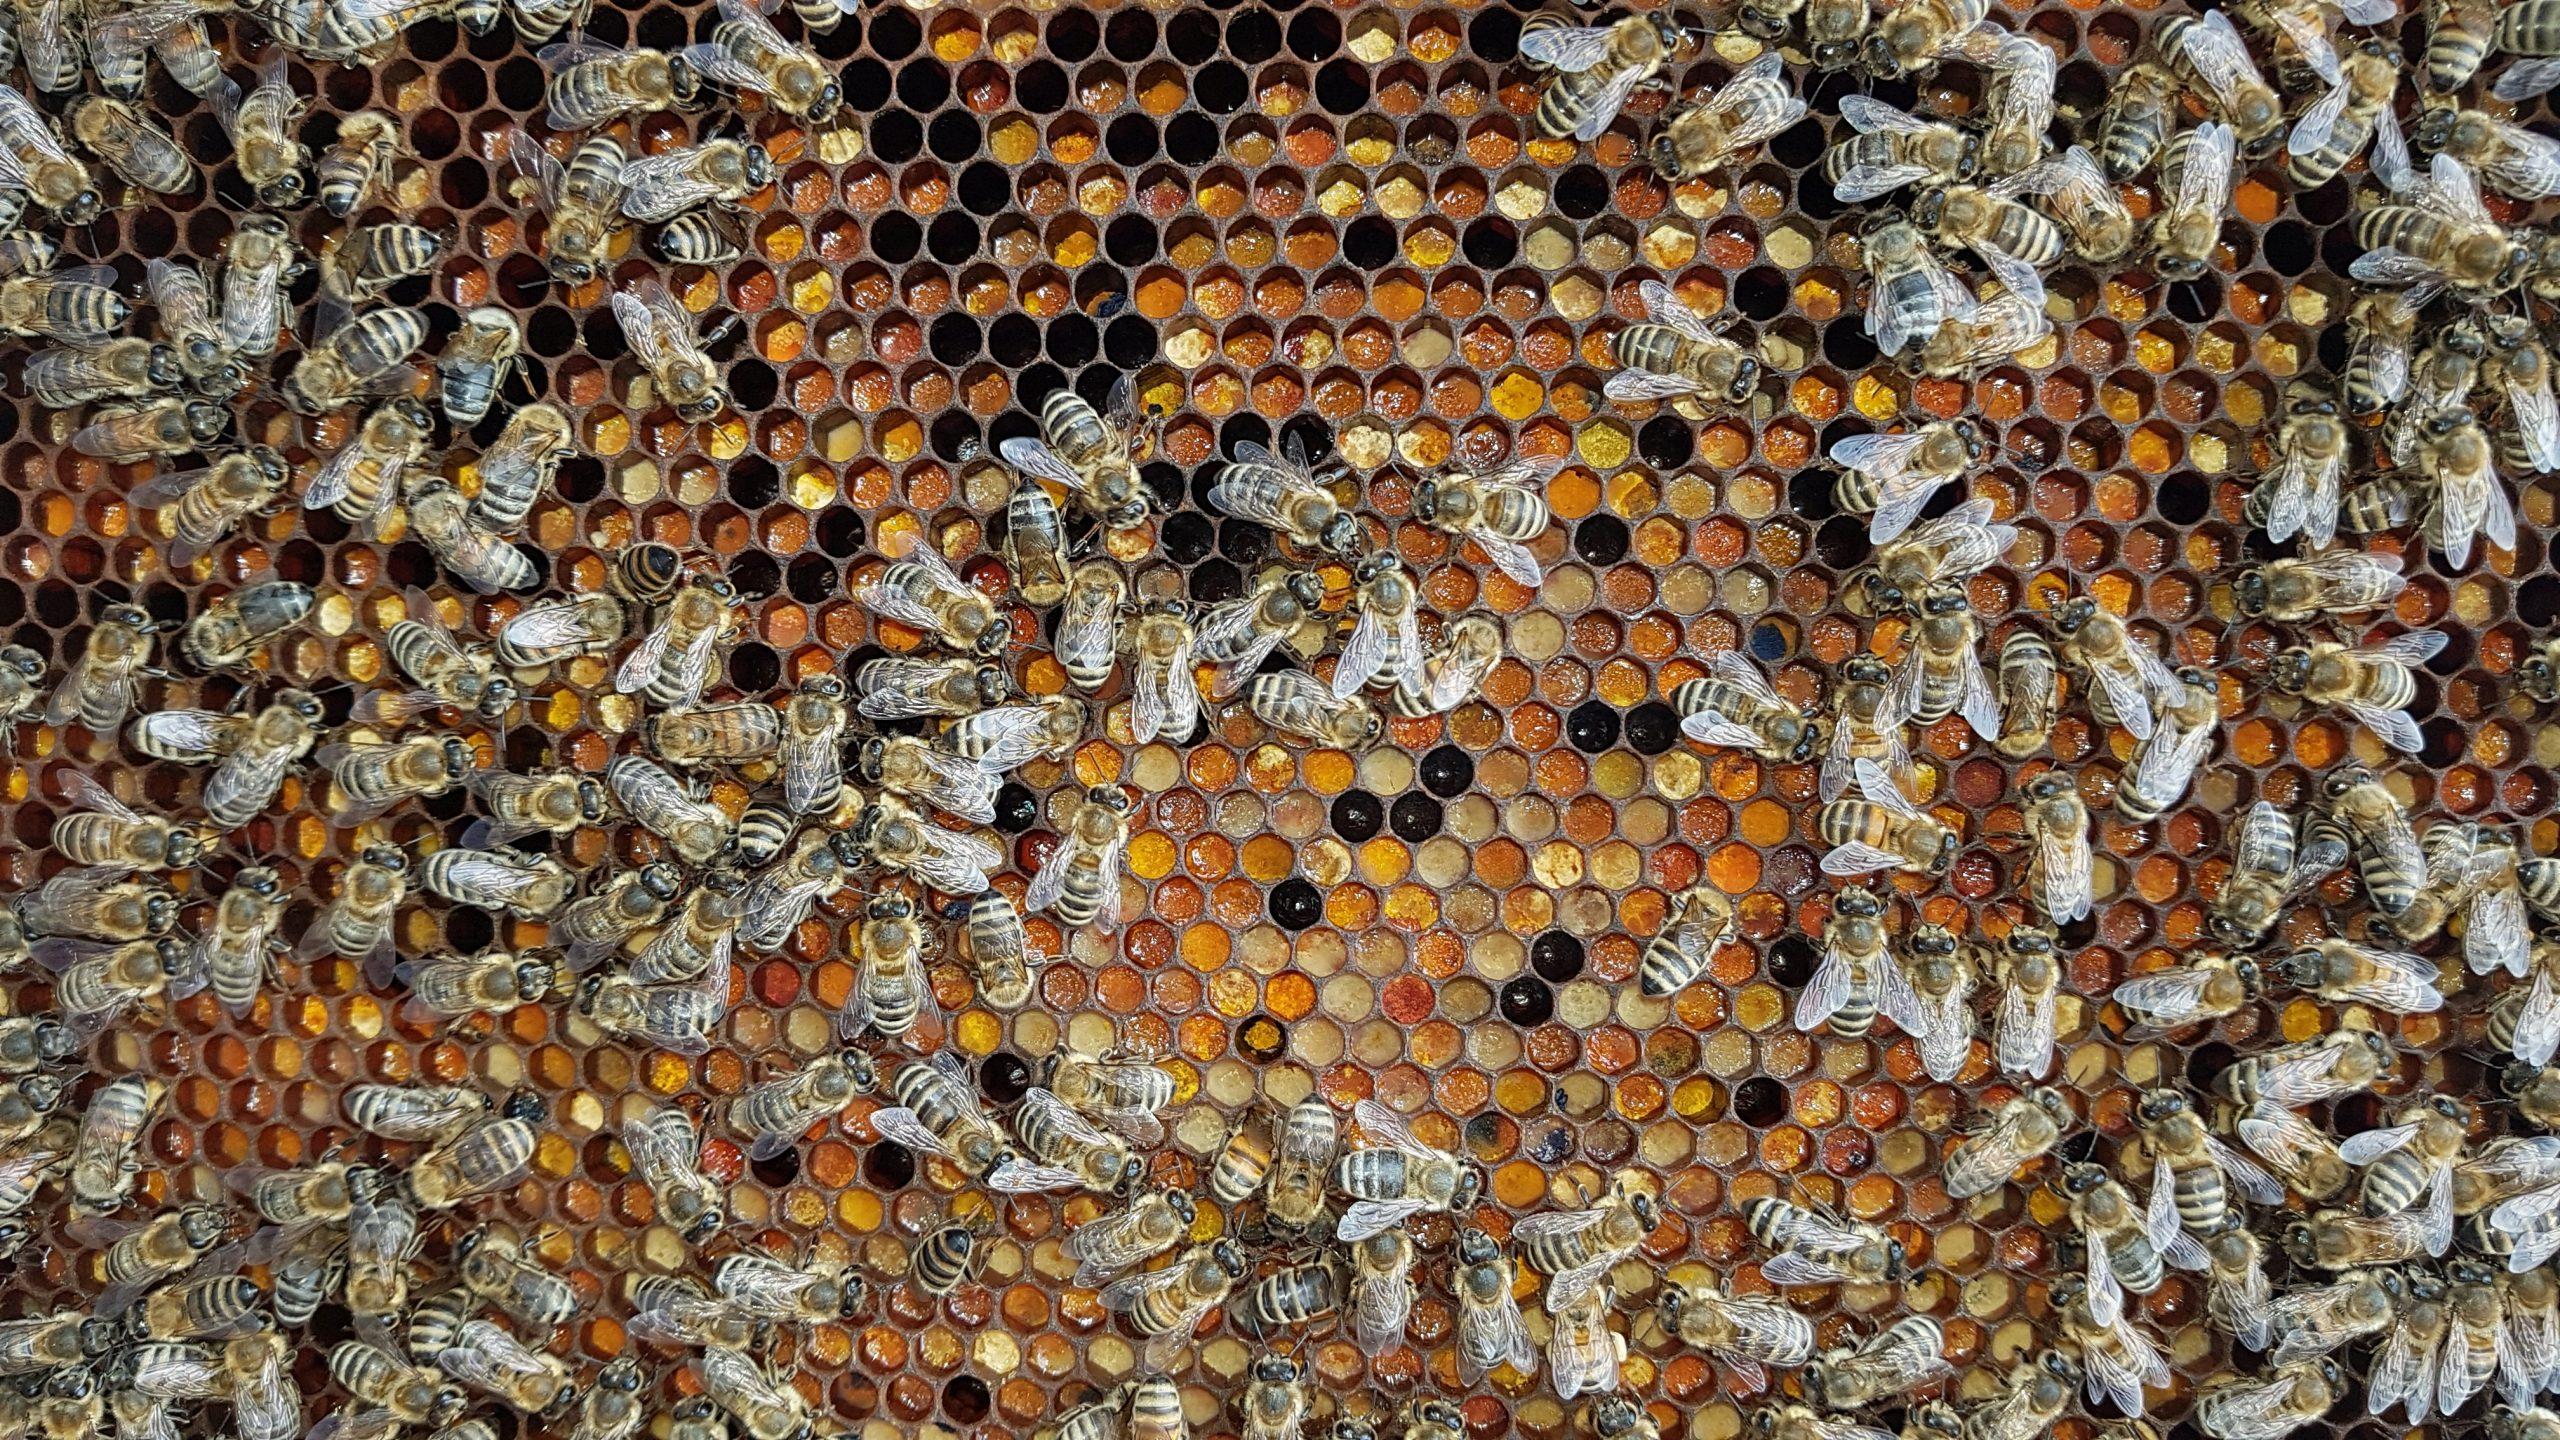 PollenPic